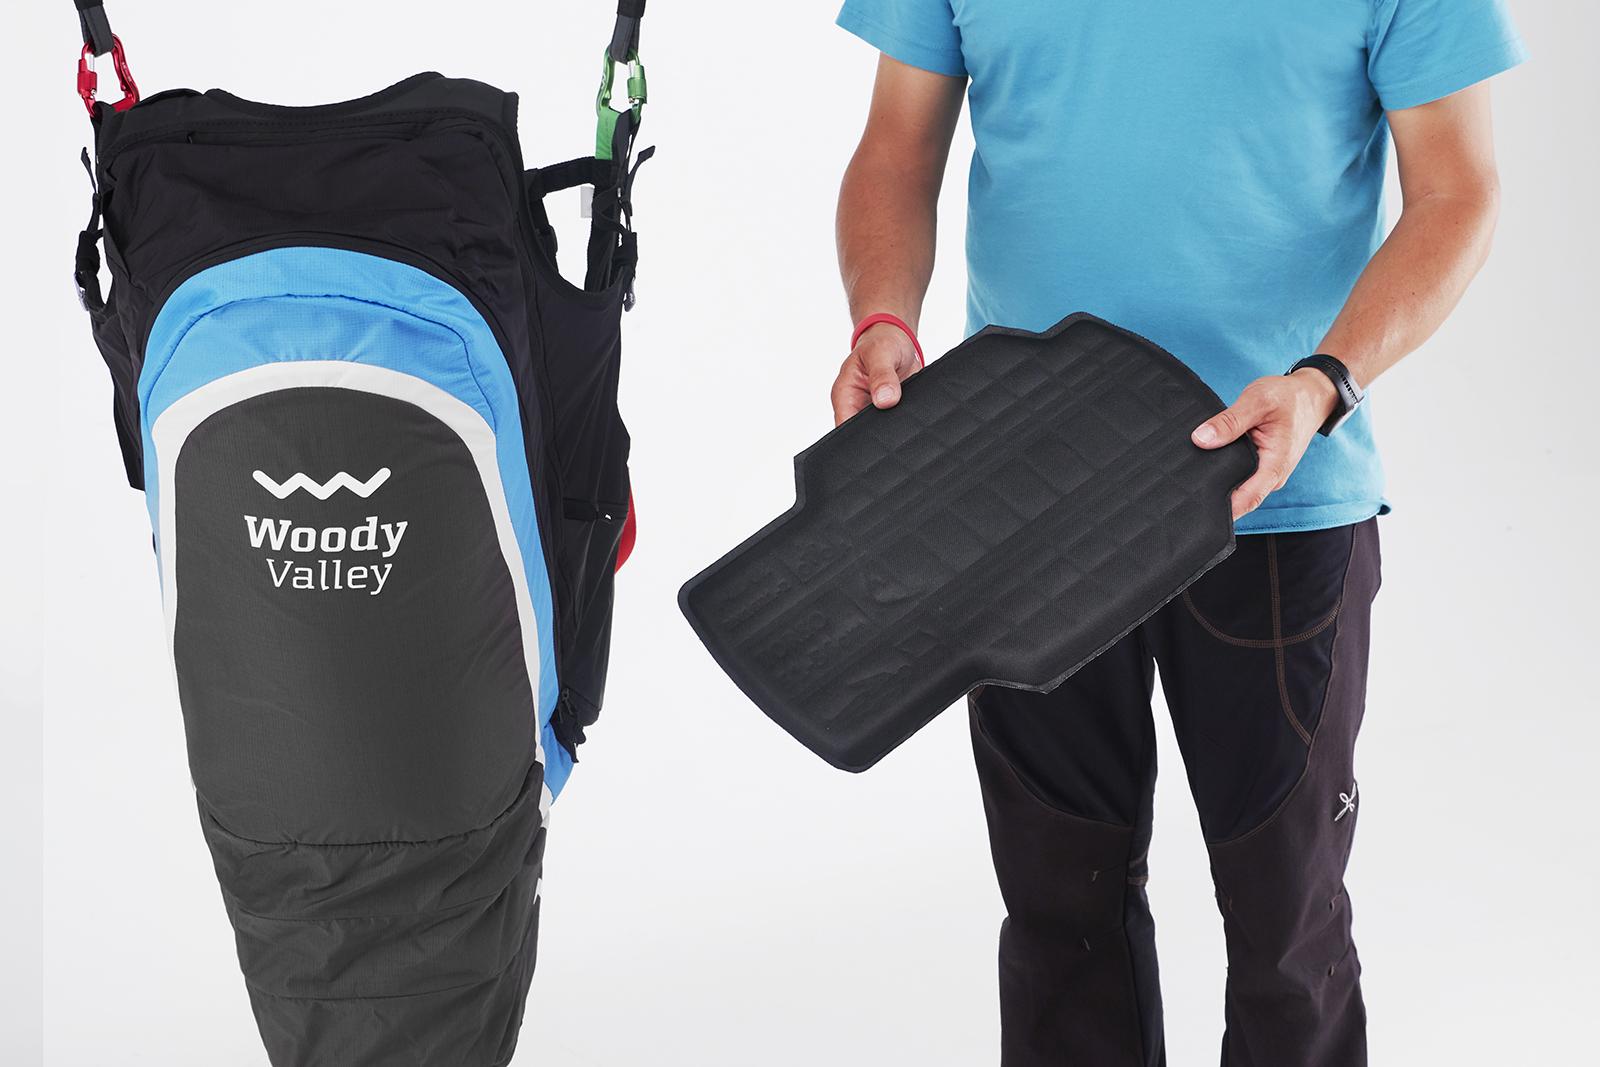 Woody Valley Wani 2 Lightshield back protector